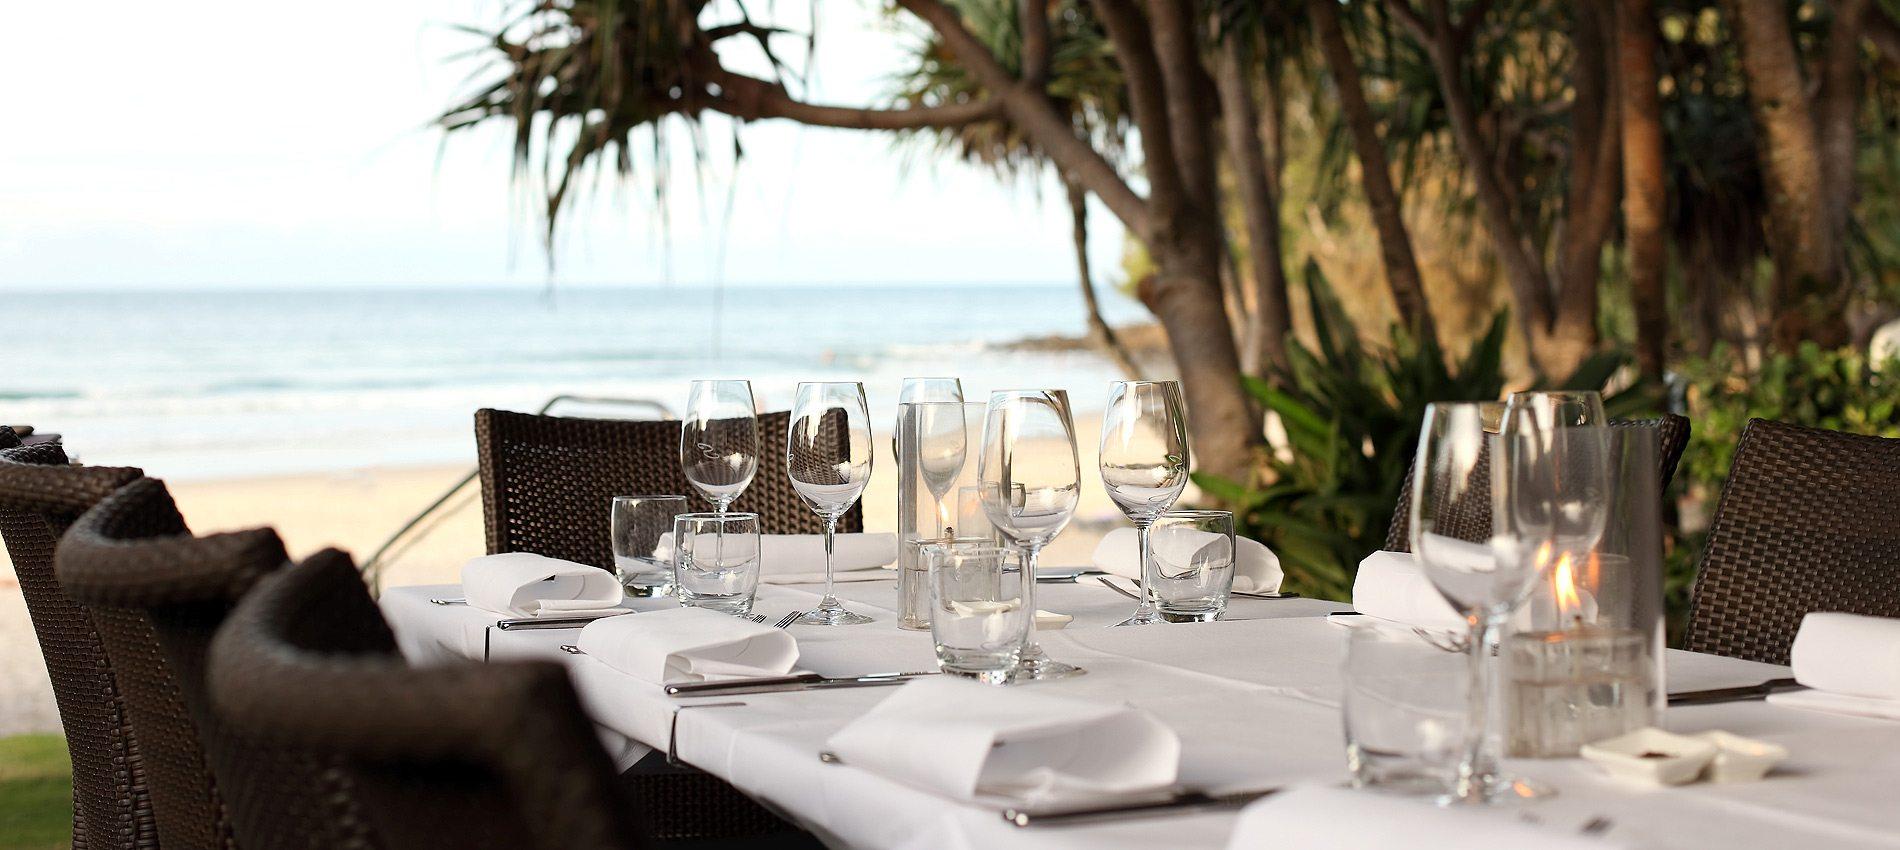 Sails Restaurant Noosa Beach Dining Experience Hastings Street